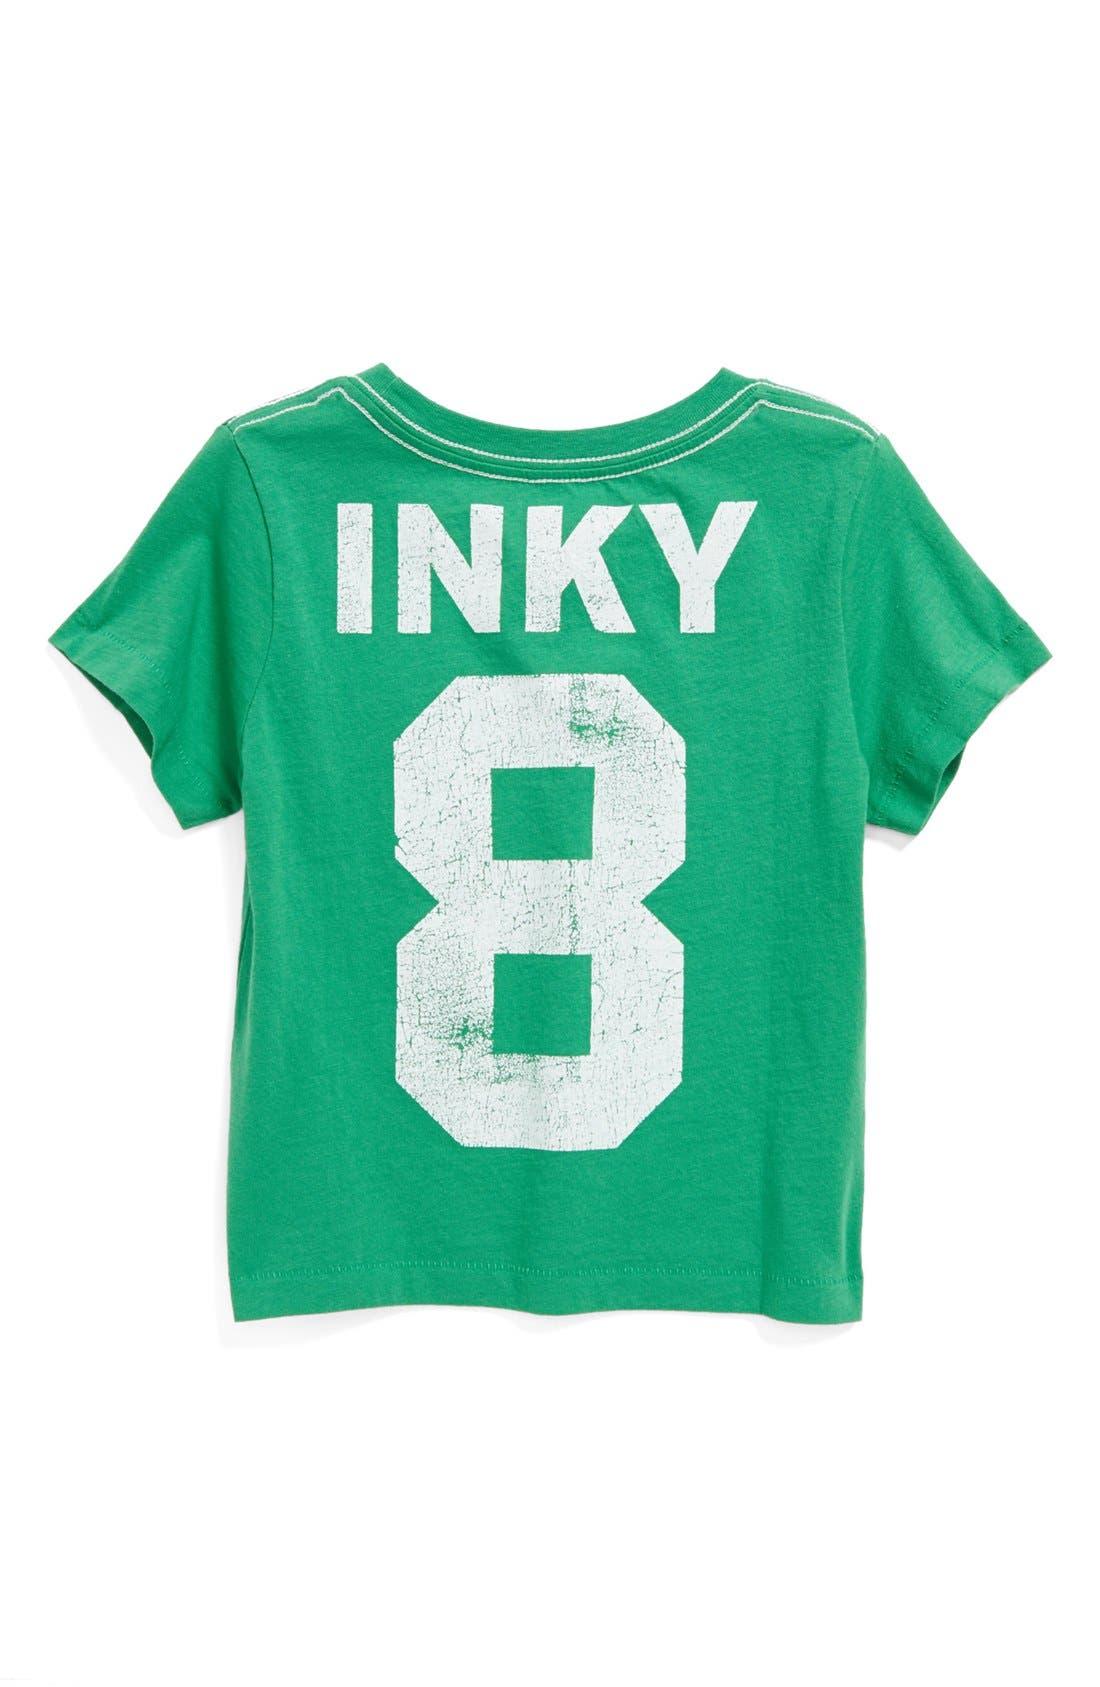 Alternate Image 2  - Peek 'Inky Octopus' T-Shirt (Baby Boys)